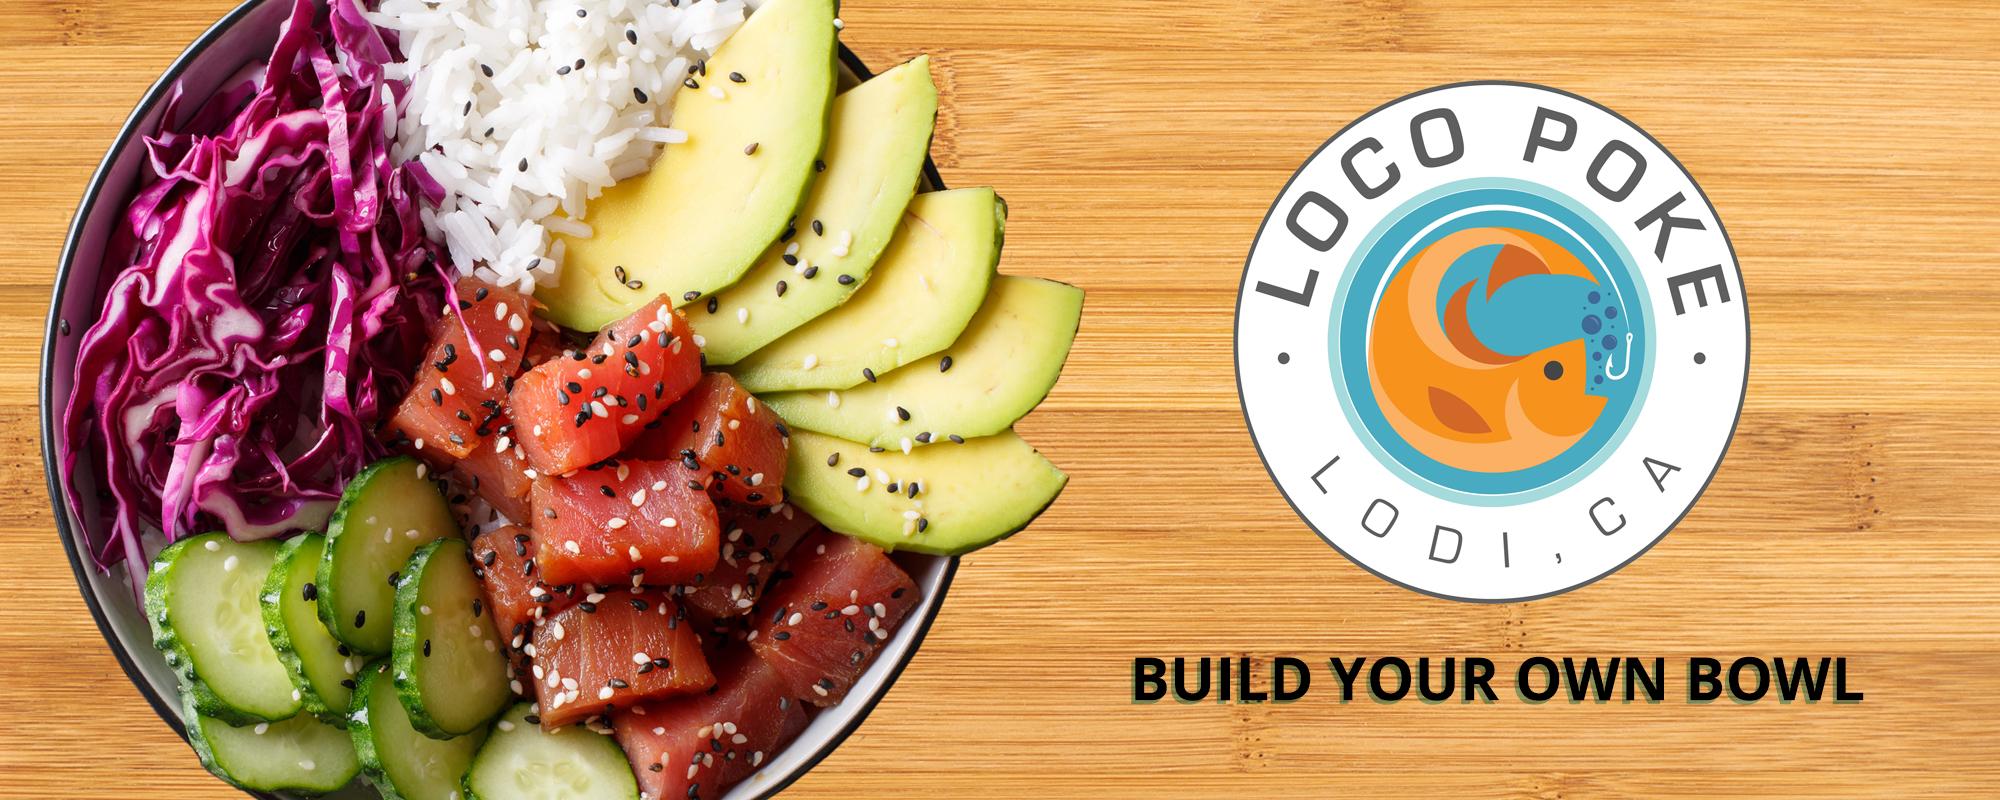 Loco Poke Lodi Ca - Hawaiian Cuisine